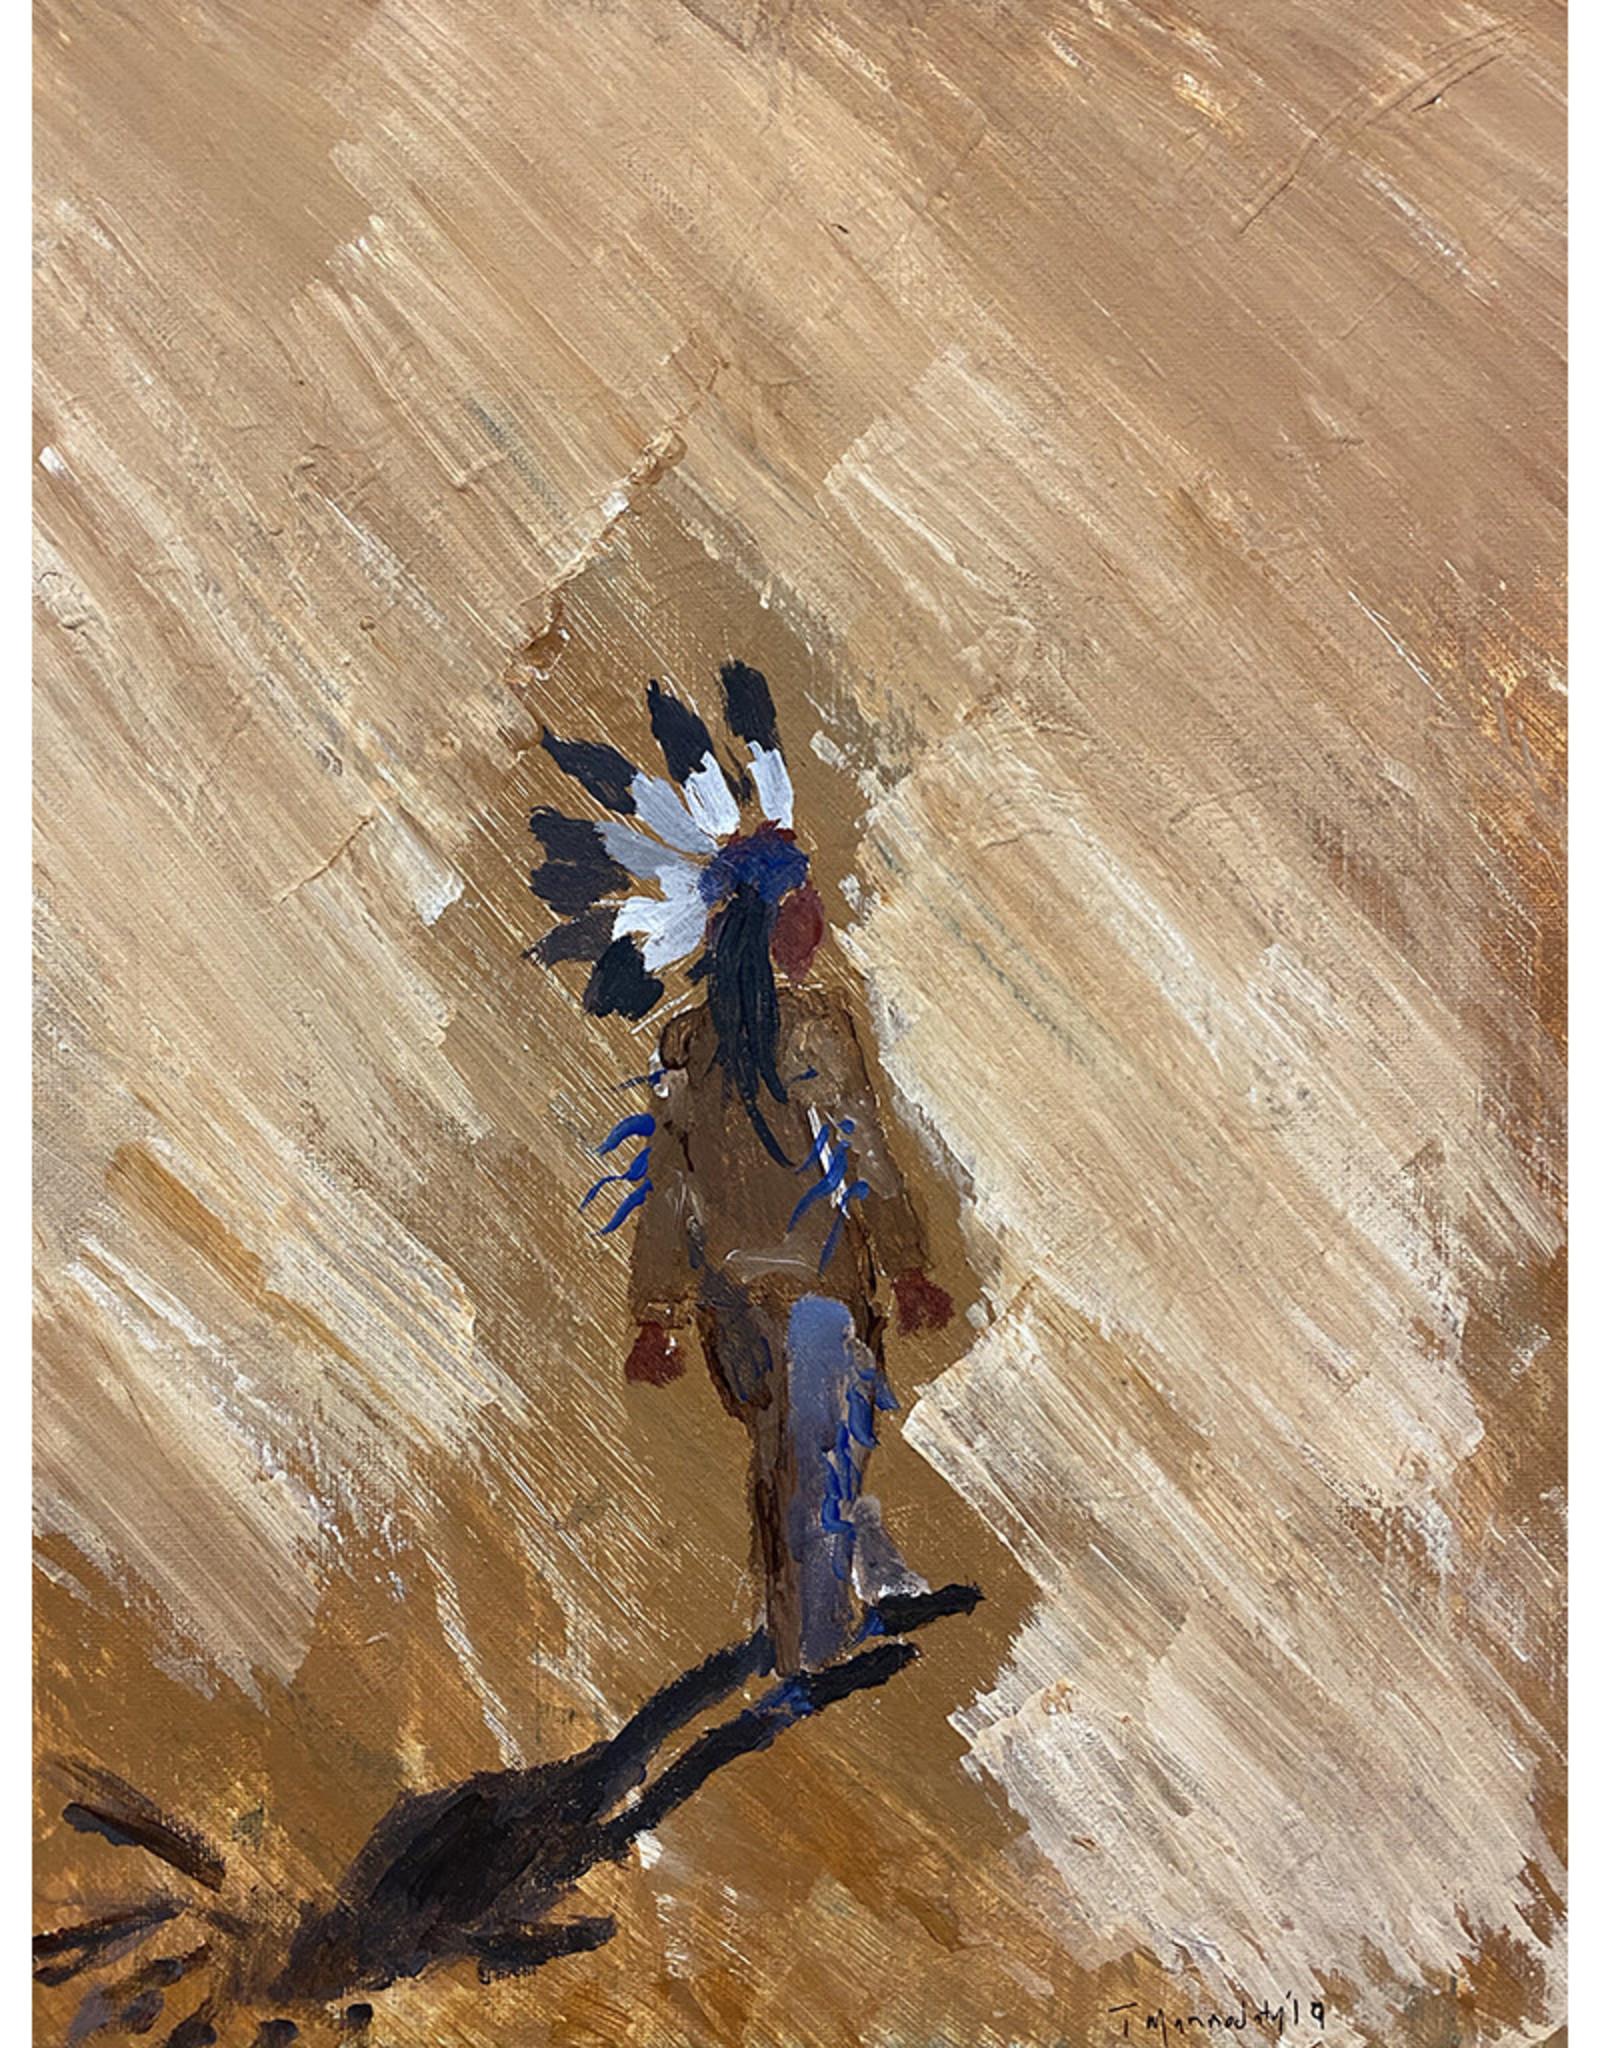 Travis Mammedaty Towards The Dawn // Original Painting by Travis Mammedaty